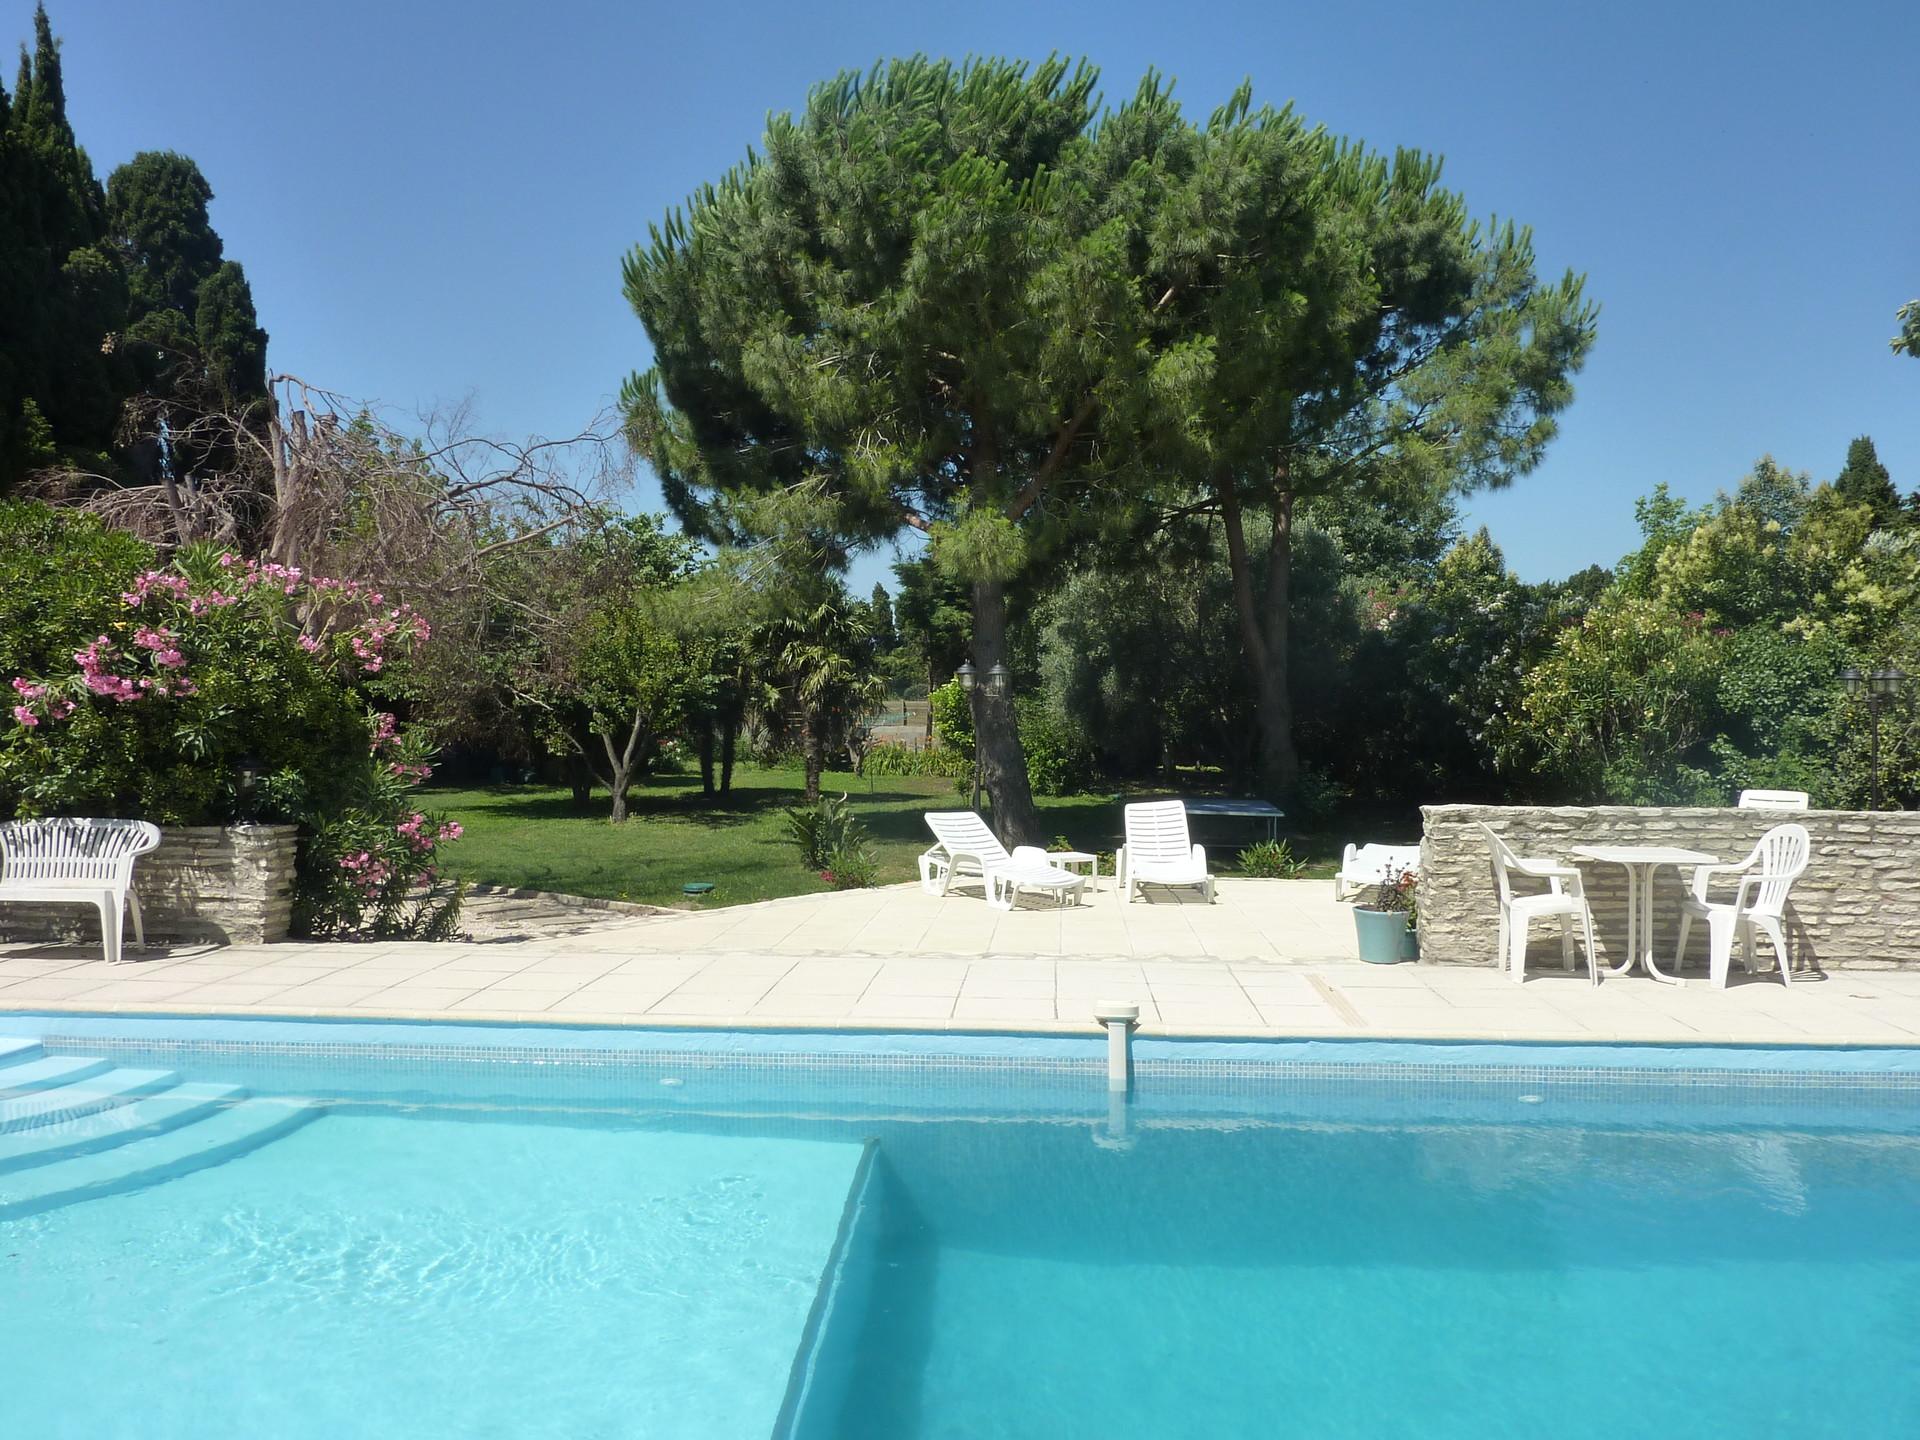 colocation dans maison avec 4 chambres piscine jardin 10. Black Bedroom Furniture Sets. Home Design Ideas